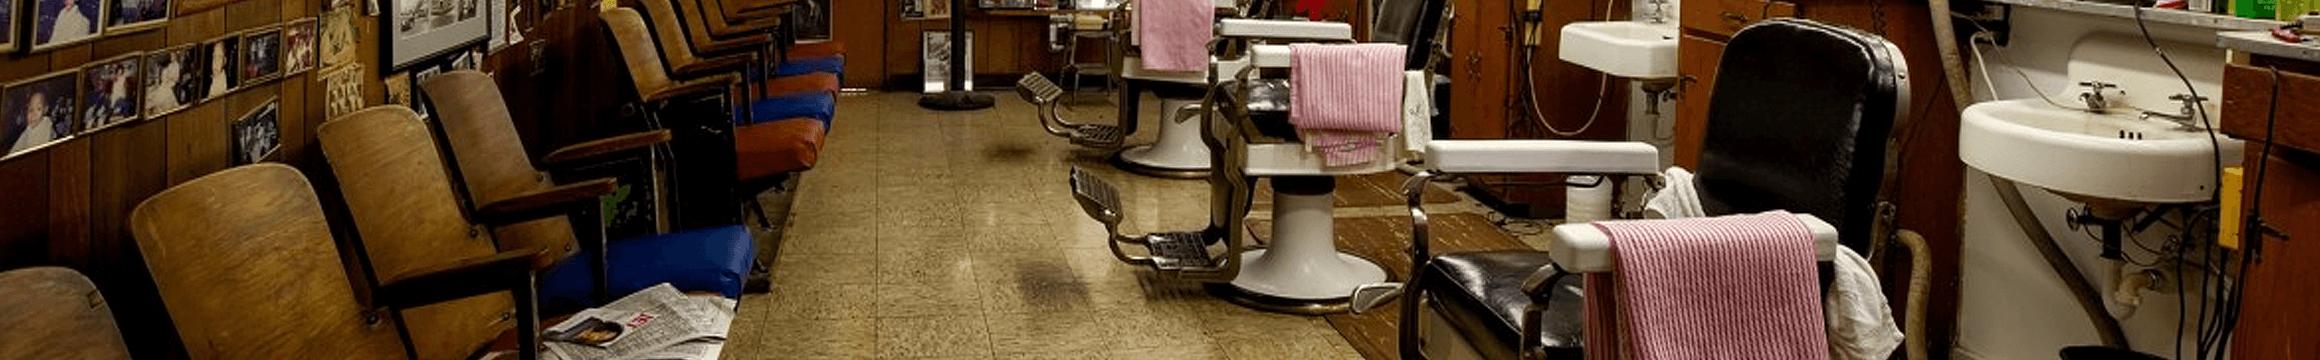 Barber 02